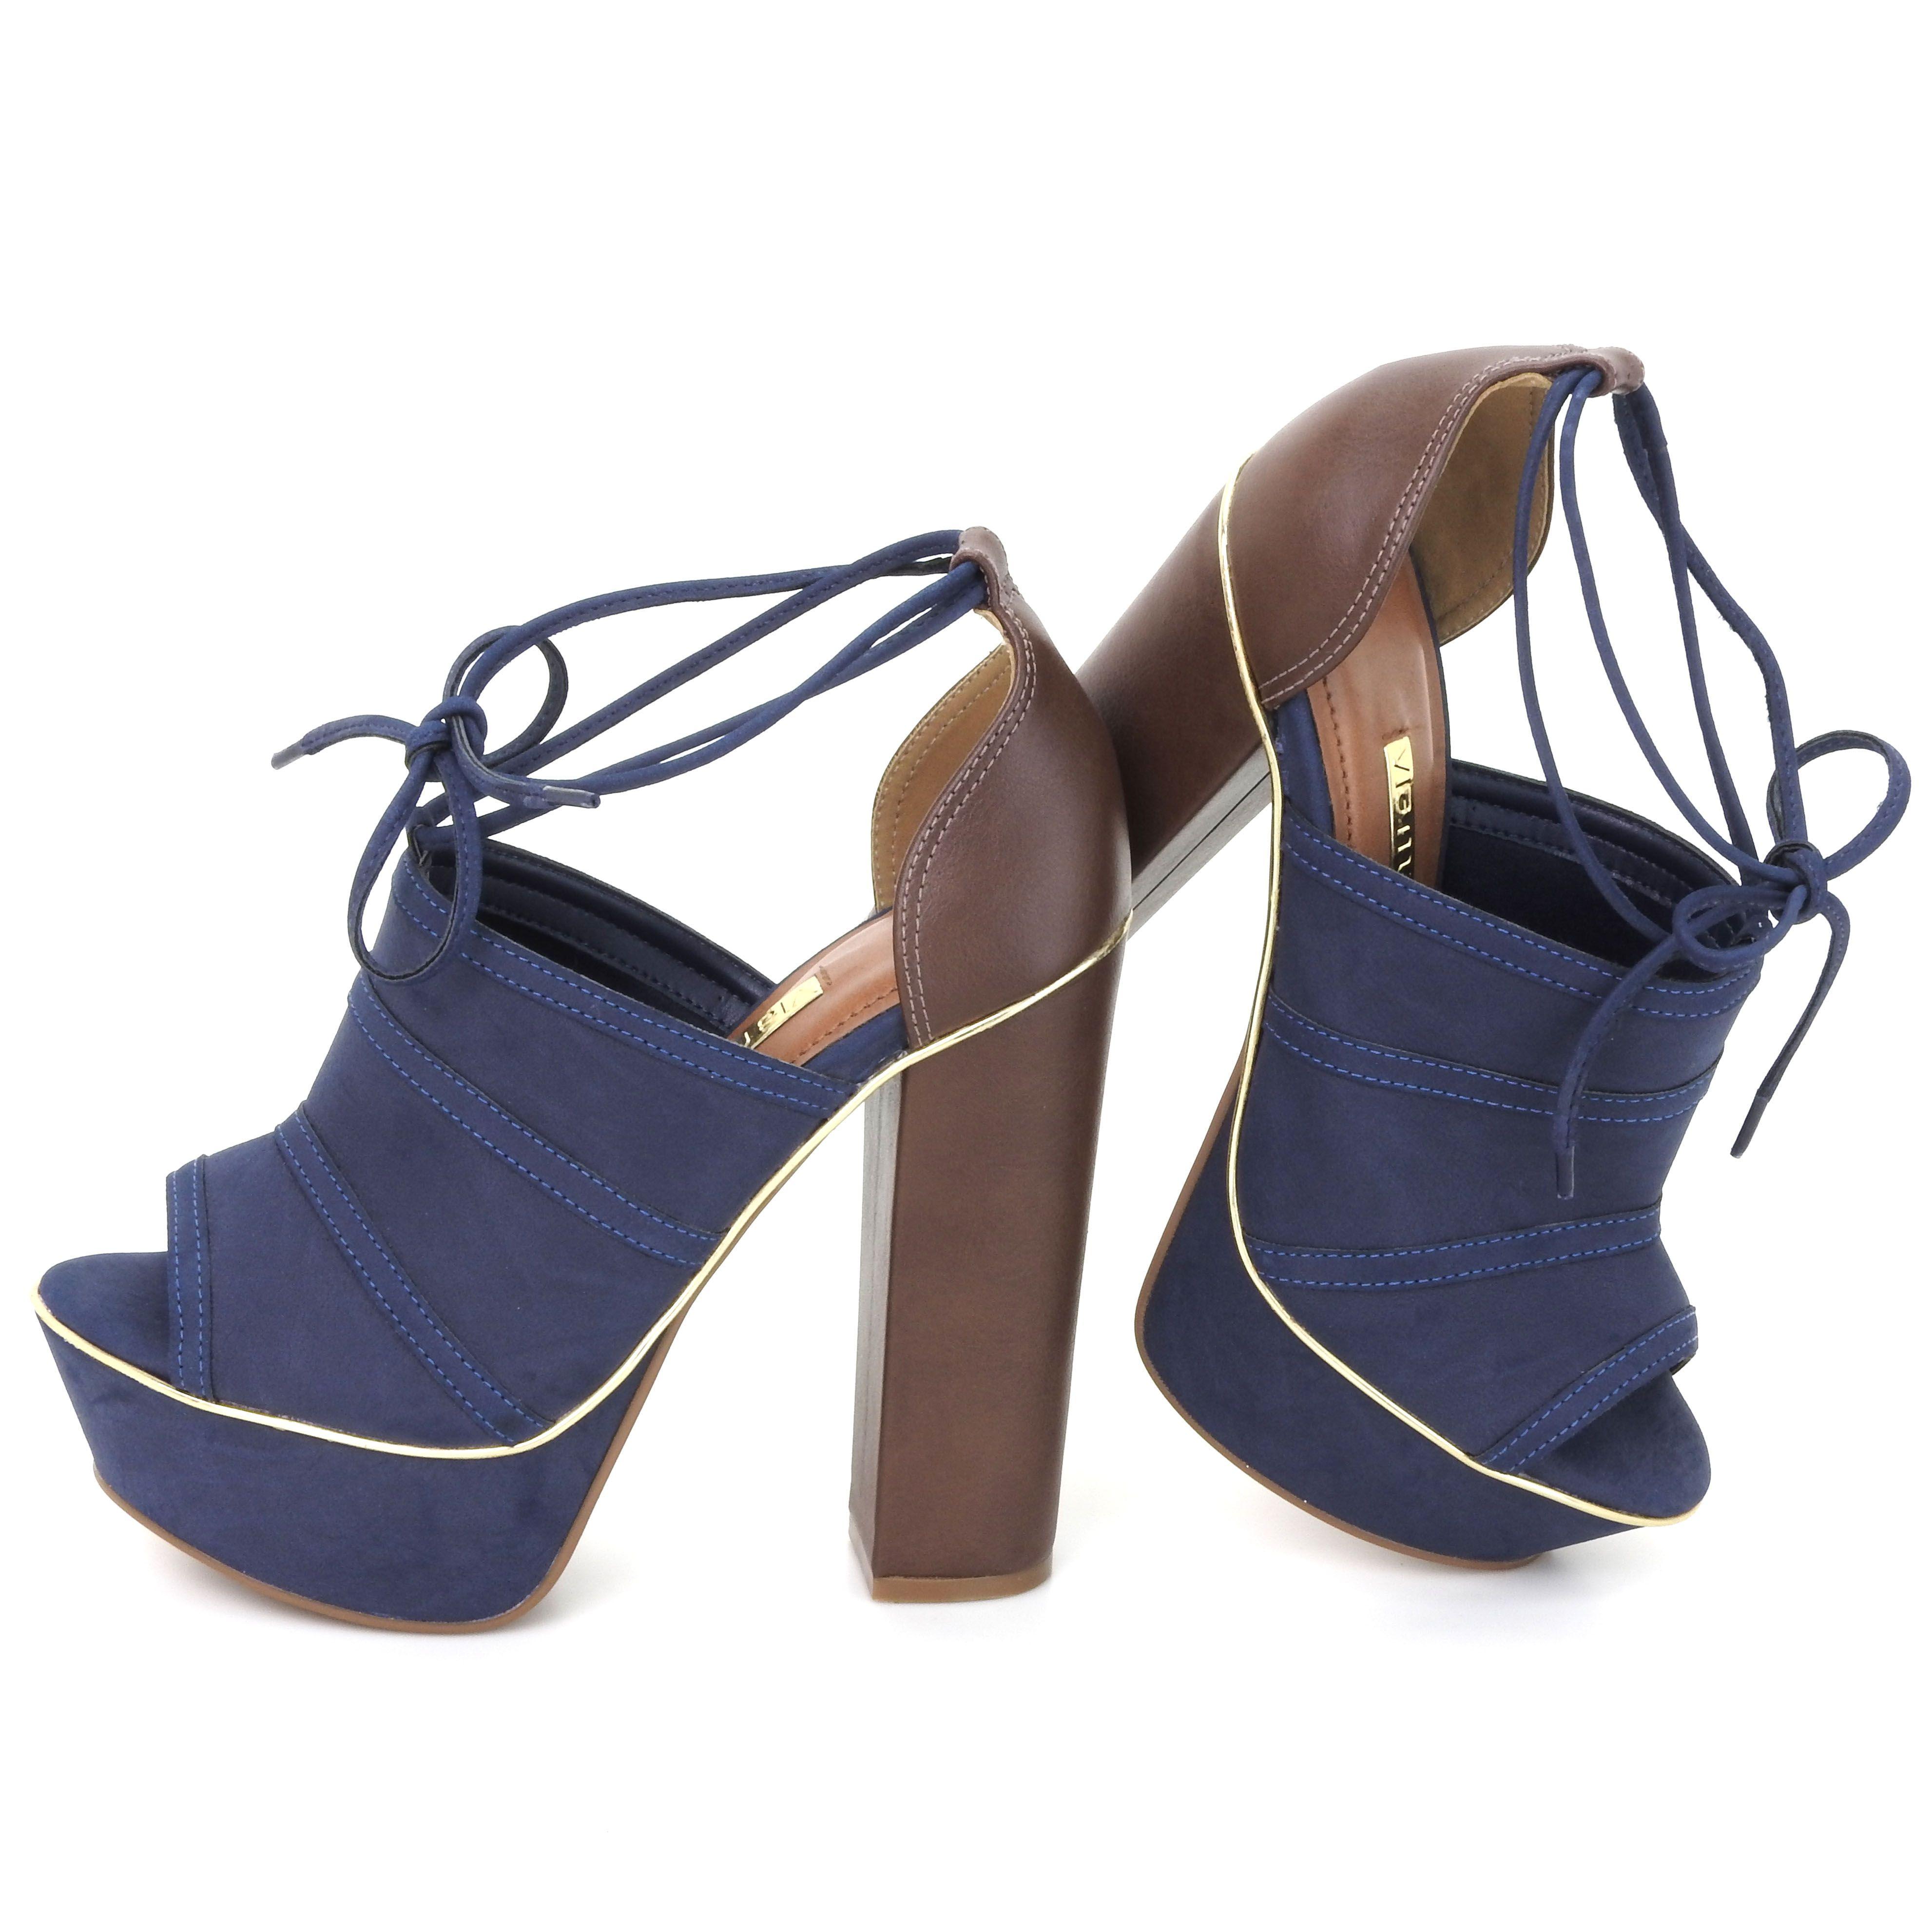 2dbc281f57 sandália - salto alto - heels - Inverno 2016 - Ref. 16-601 ...